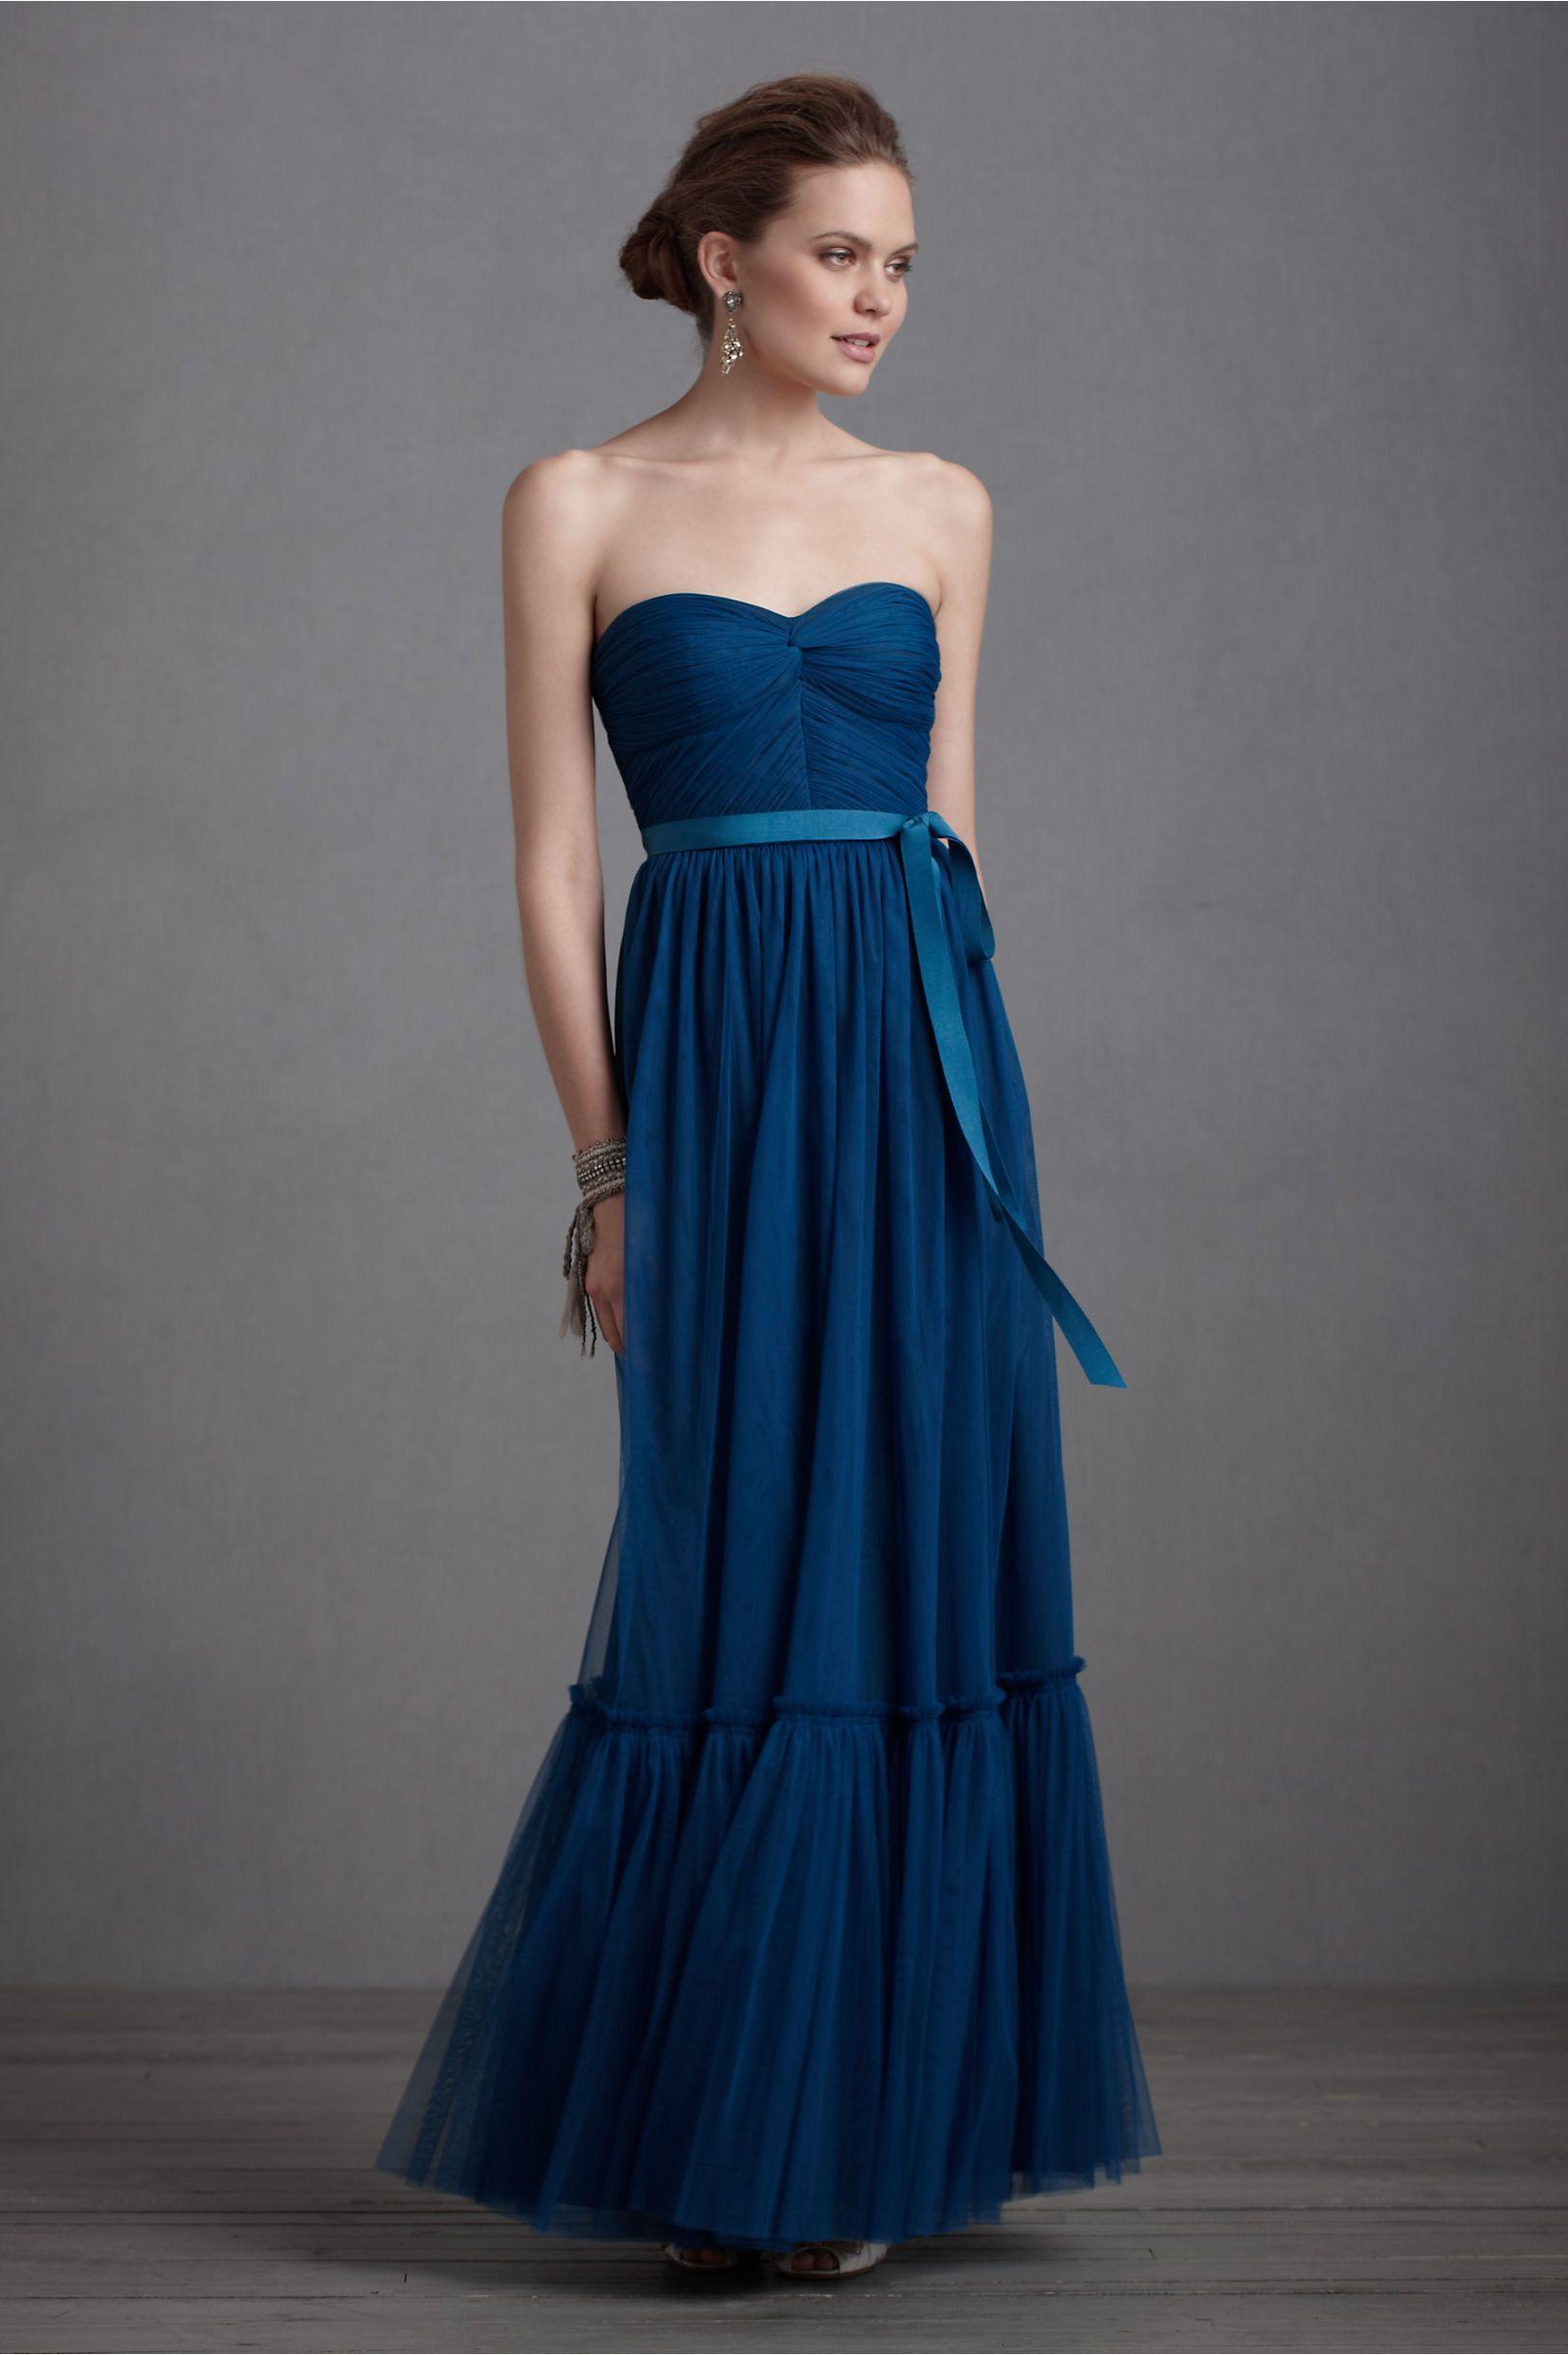 Finest navy bridesmaid dresses ideas navy blue bridesmaid dresses